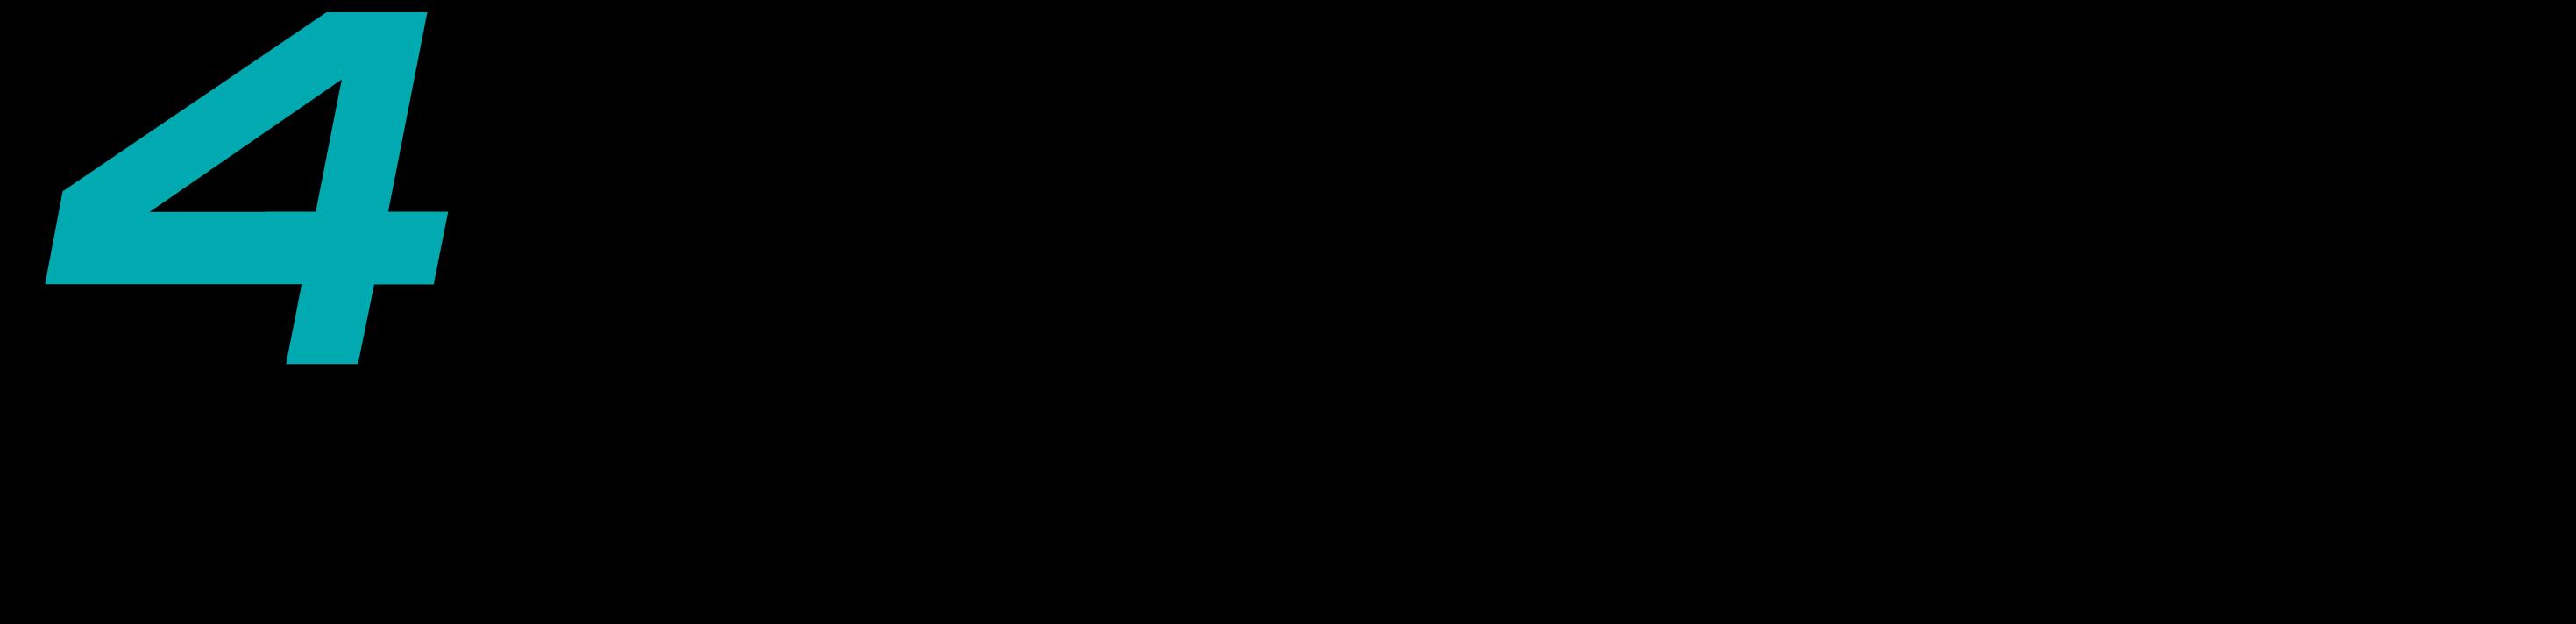 Cursos 4Linux